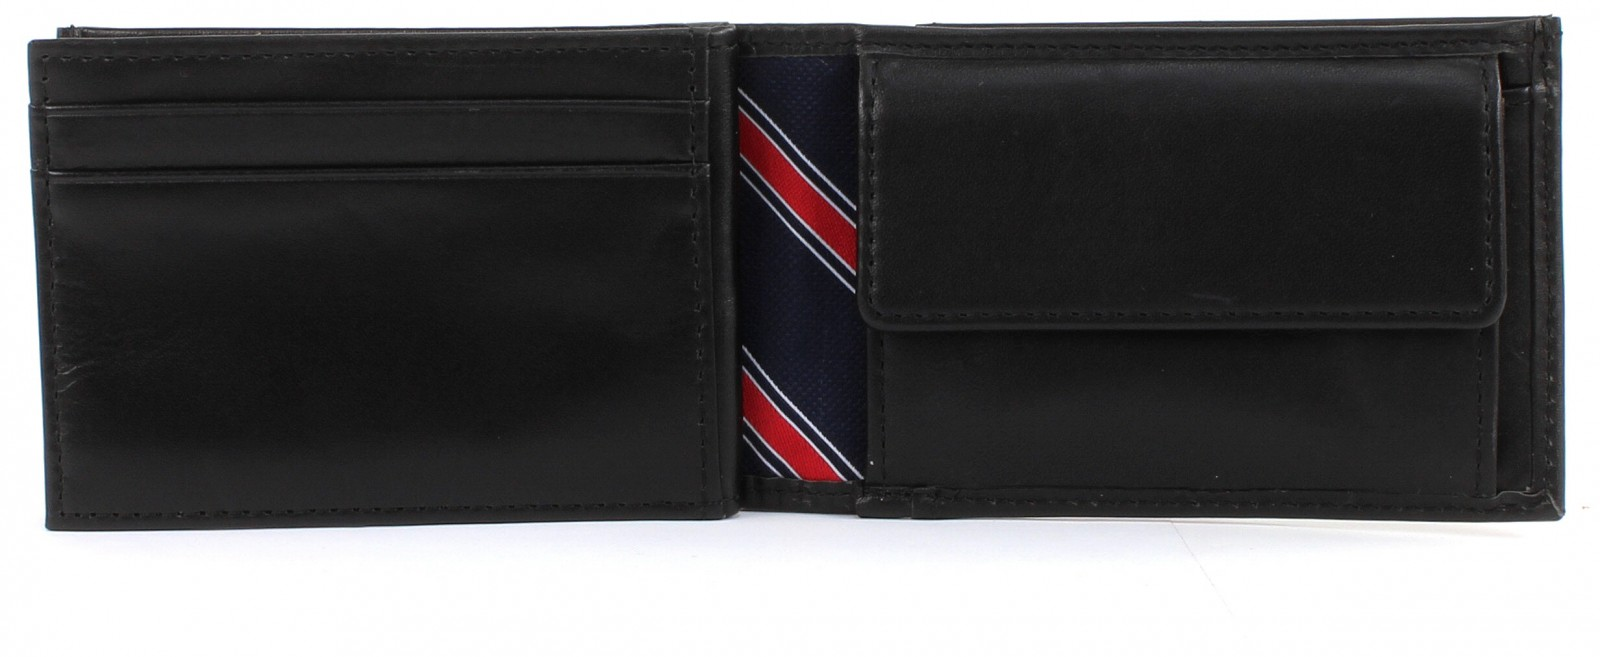 TOMMY HILFIGER Eton Mini CC Flap & Coin Pocket Black